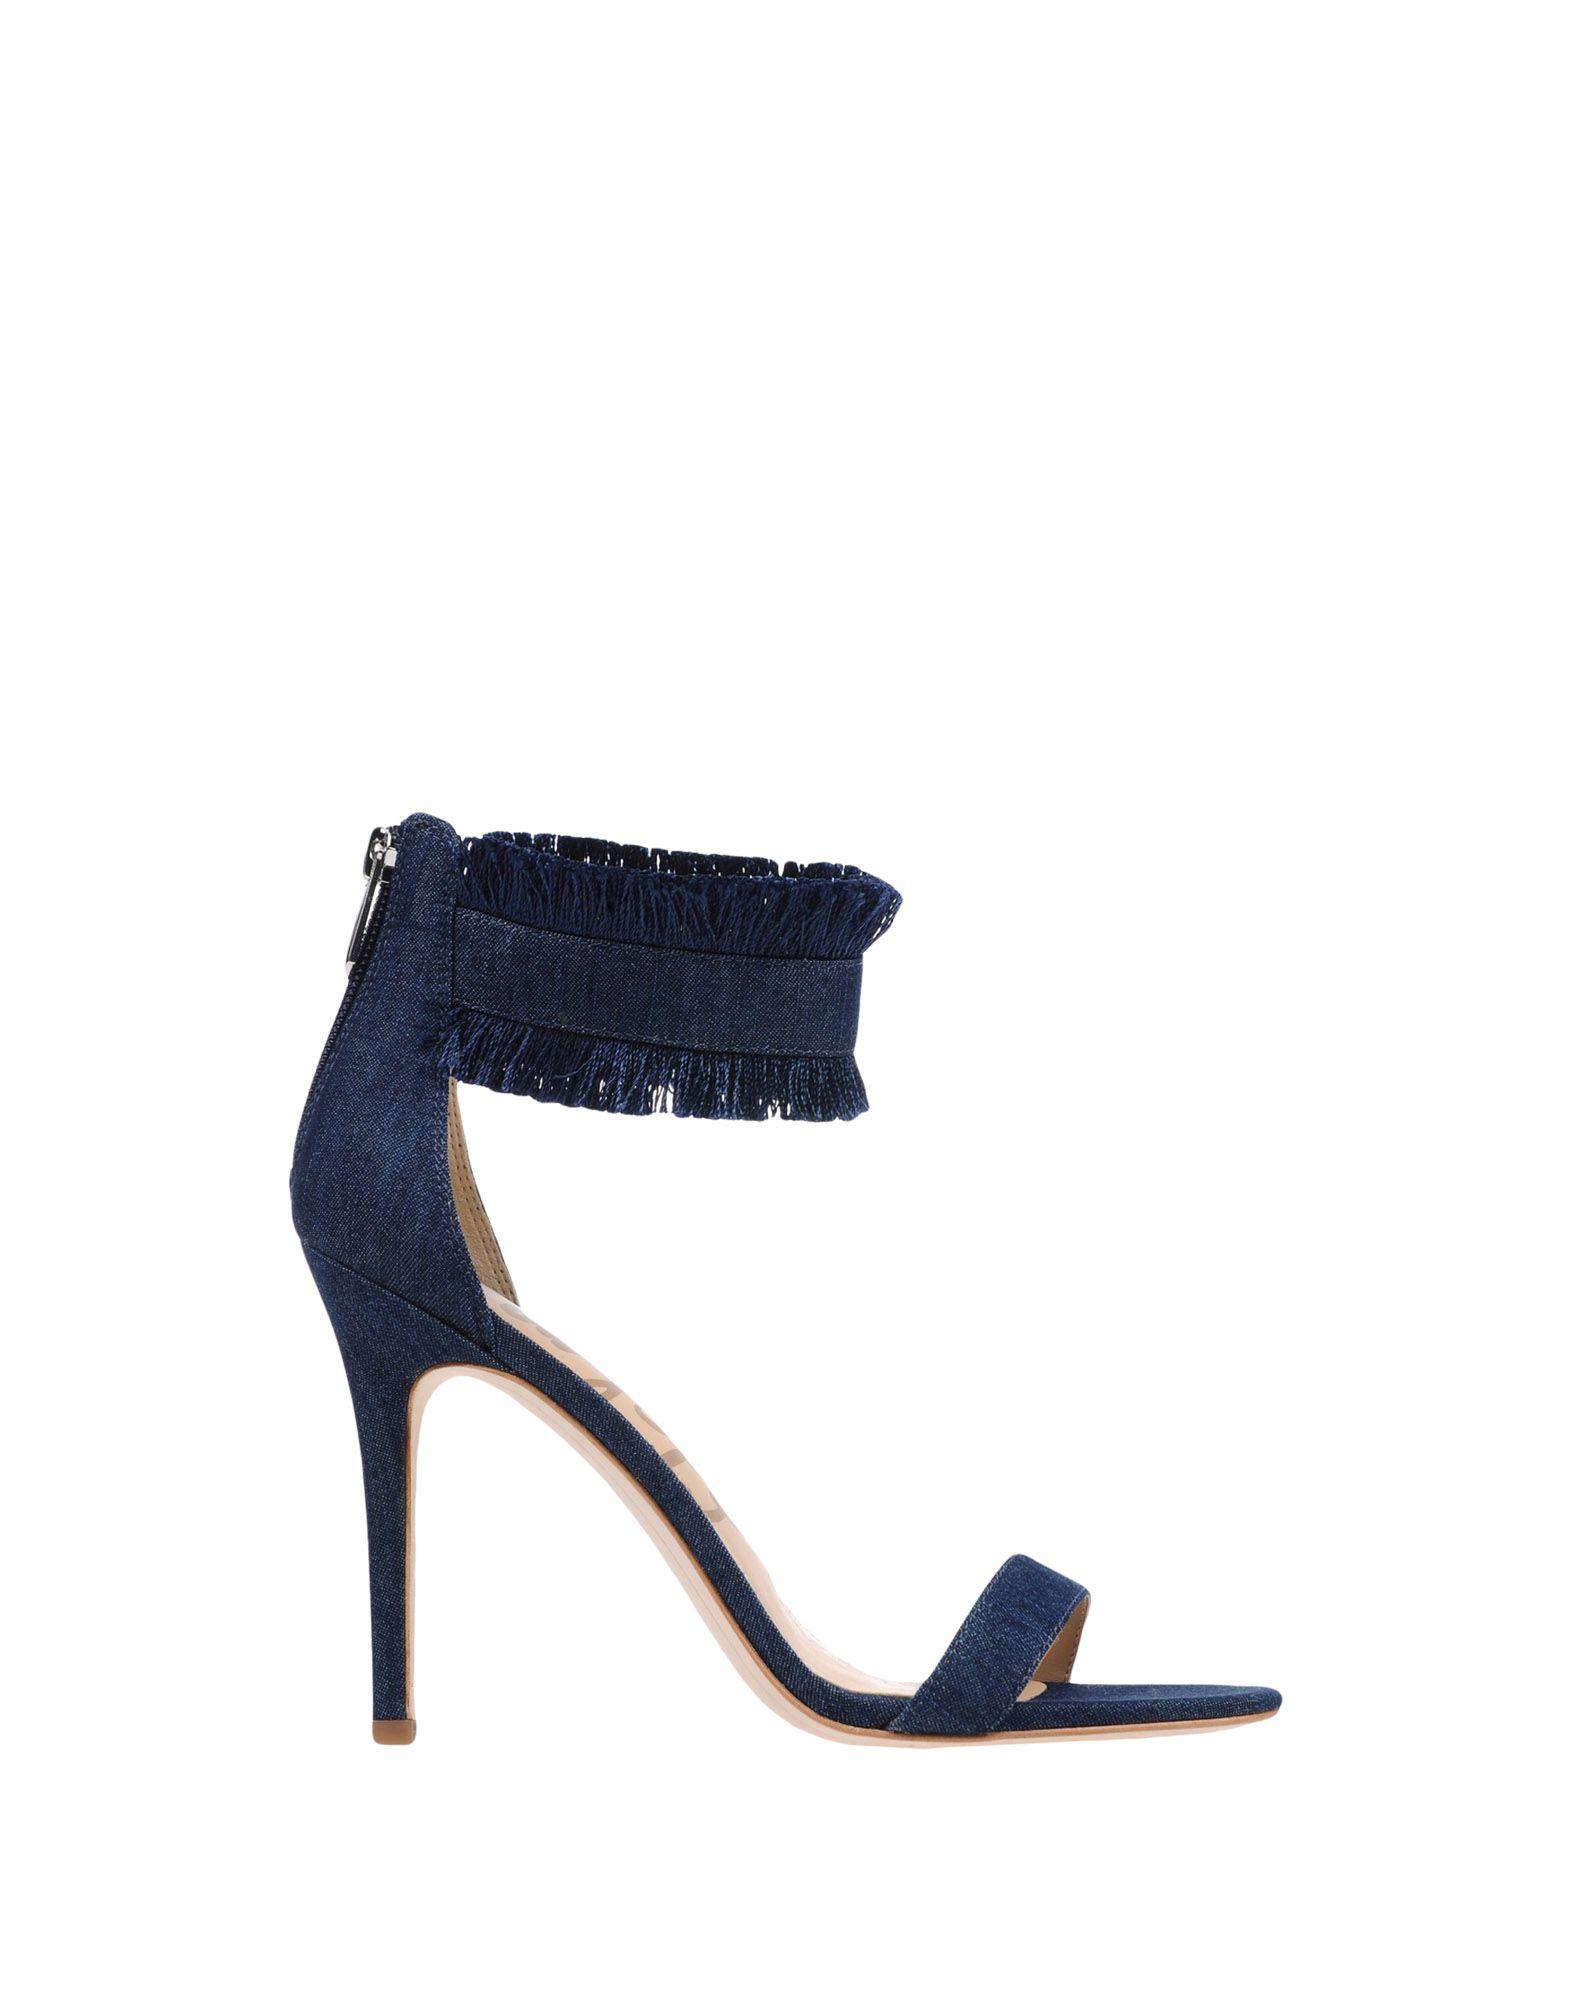 Sam Edelman Sandalen Damen  11340136EG Qualität Gute Qualität 11340136EG beliebte Schuhe 5b1392